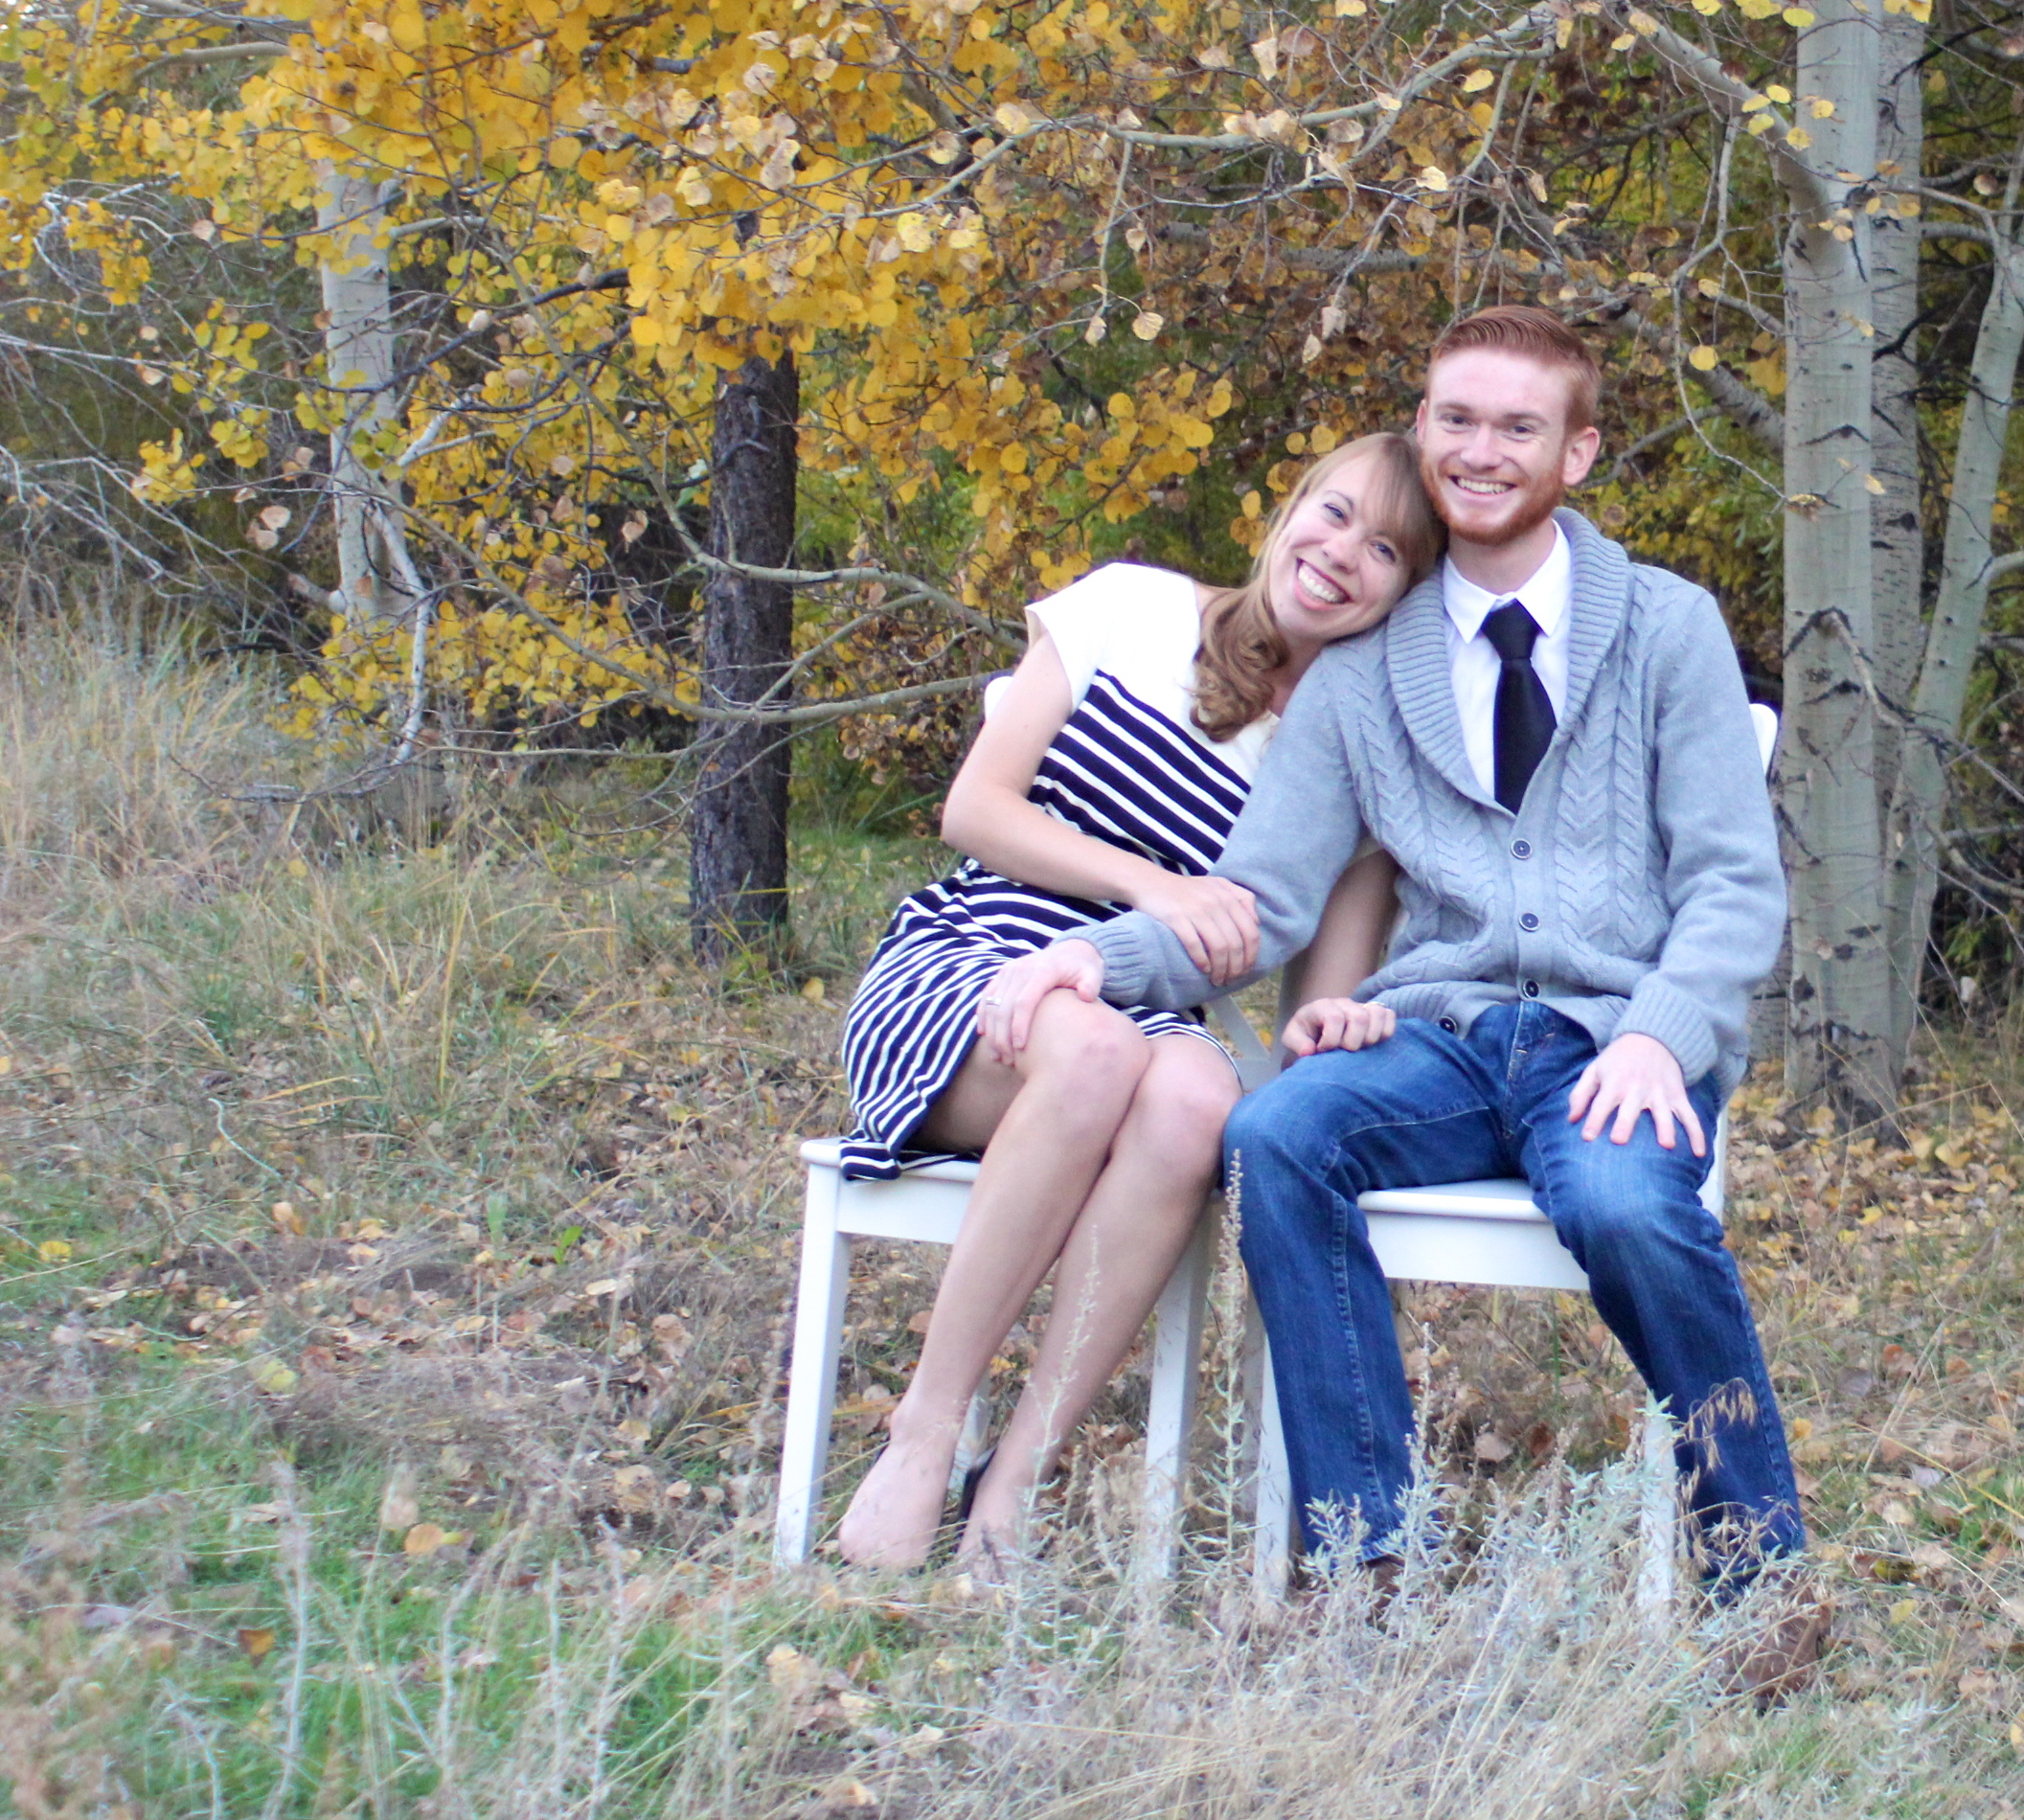 Photo Credit: Emily Greenwood Weren't we cute?